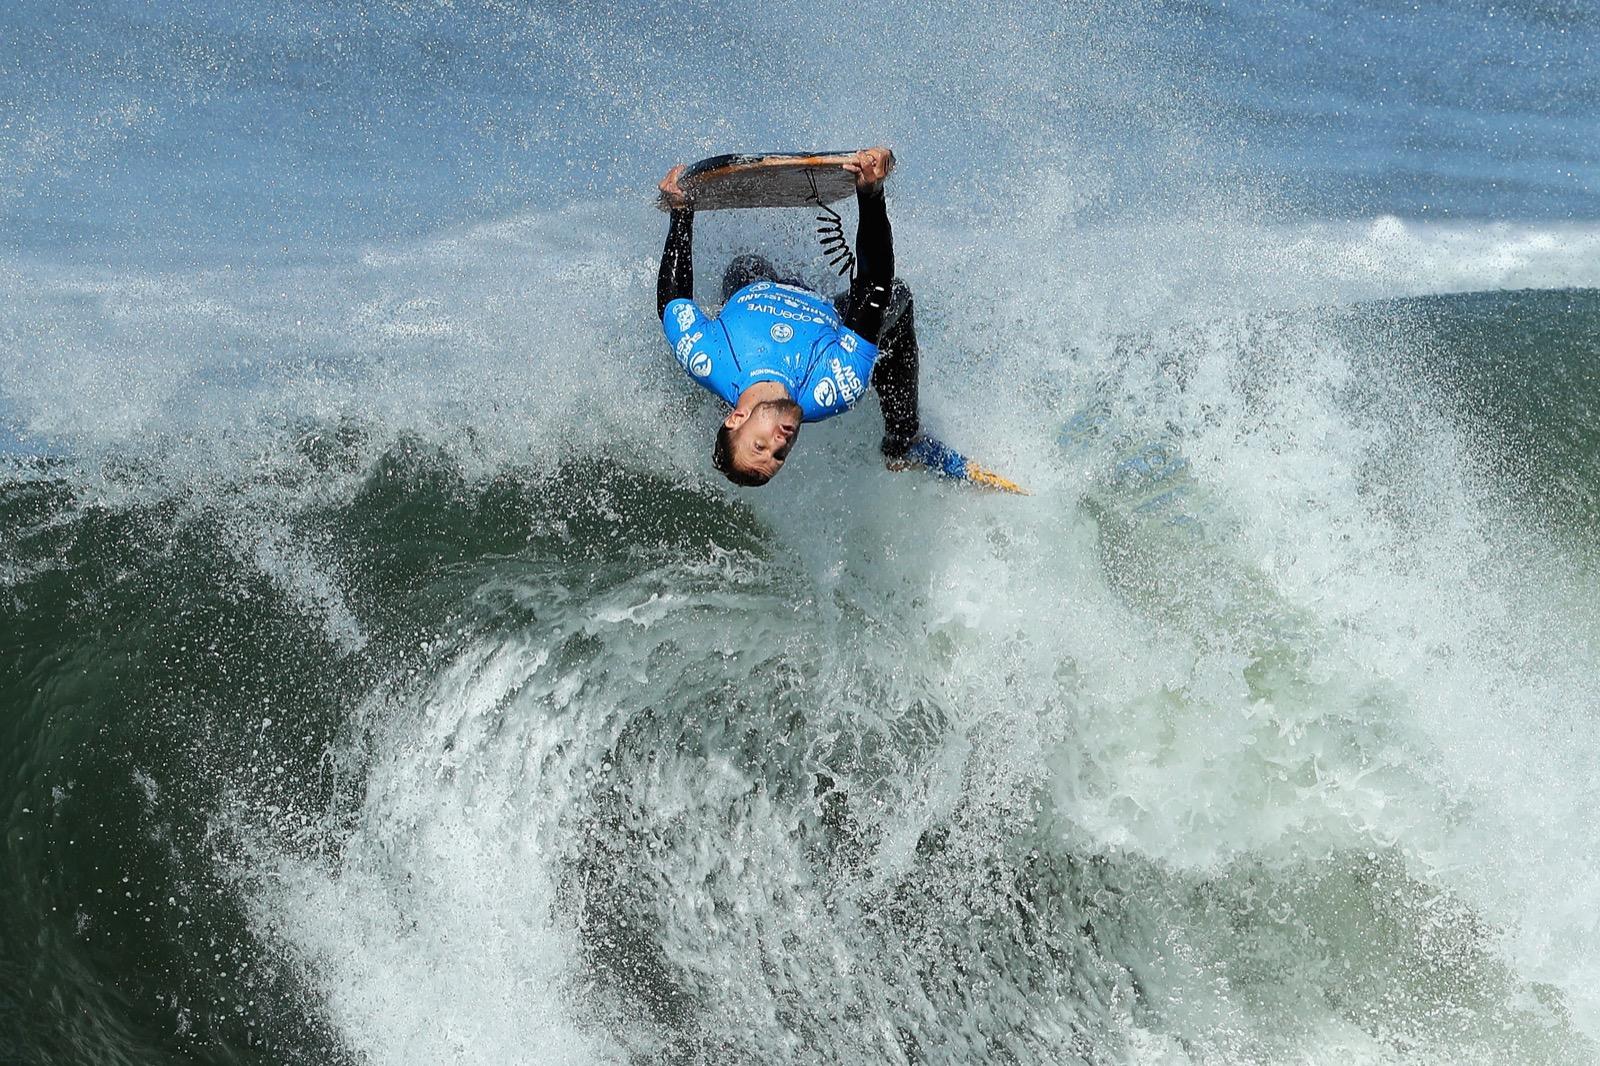 Shark Island Surfing Challenge in Sydney: Pictures